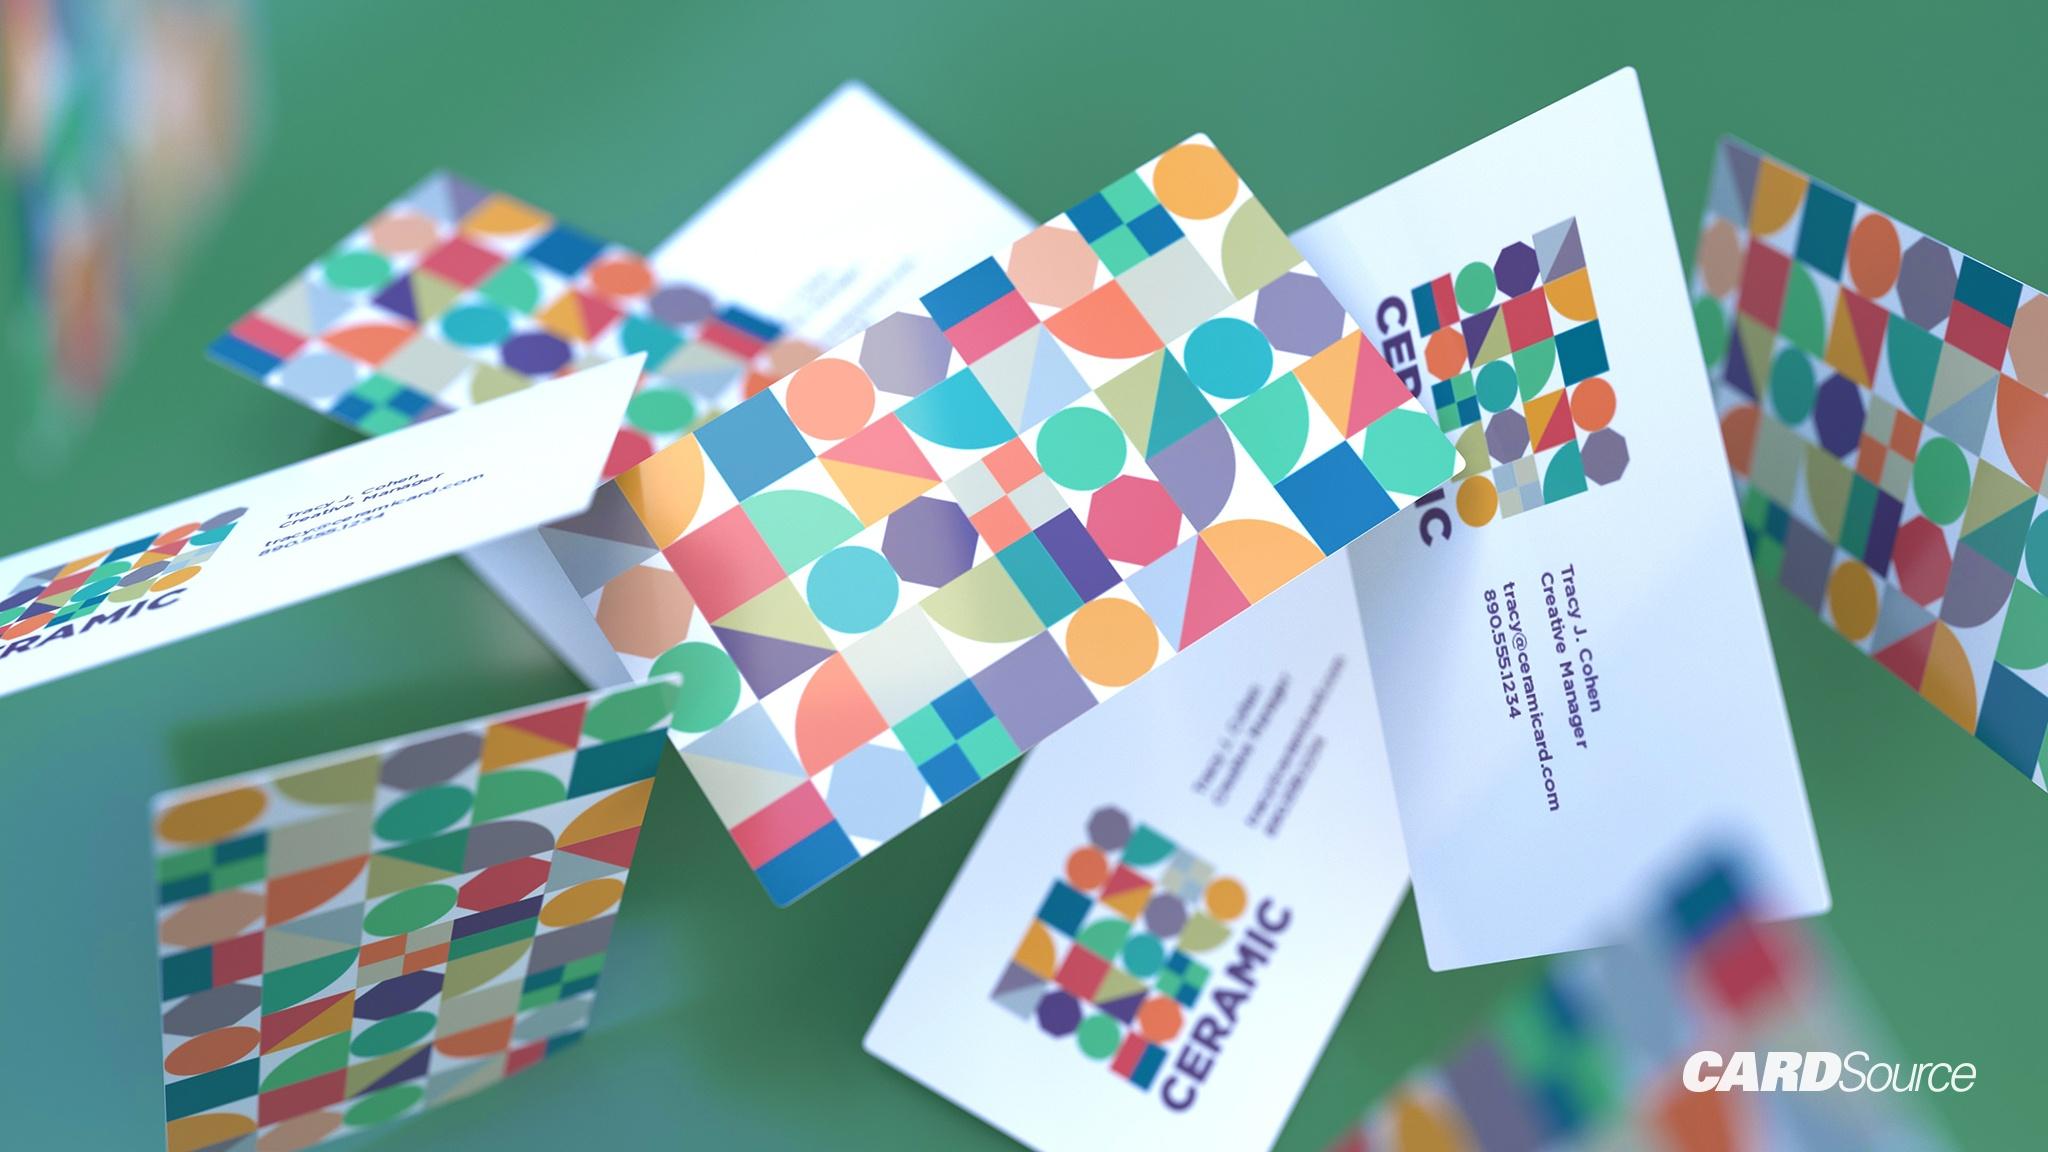 Ceramic Business card Cardsource Design